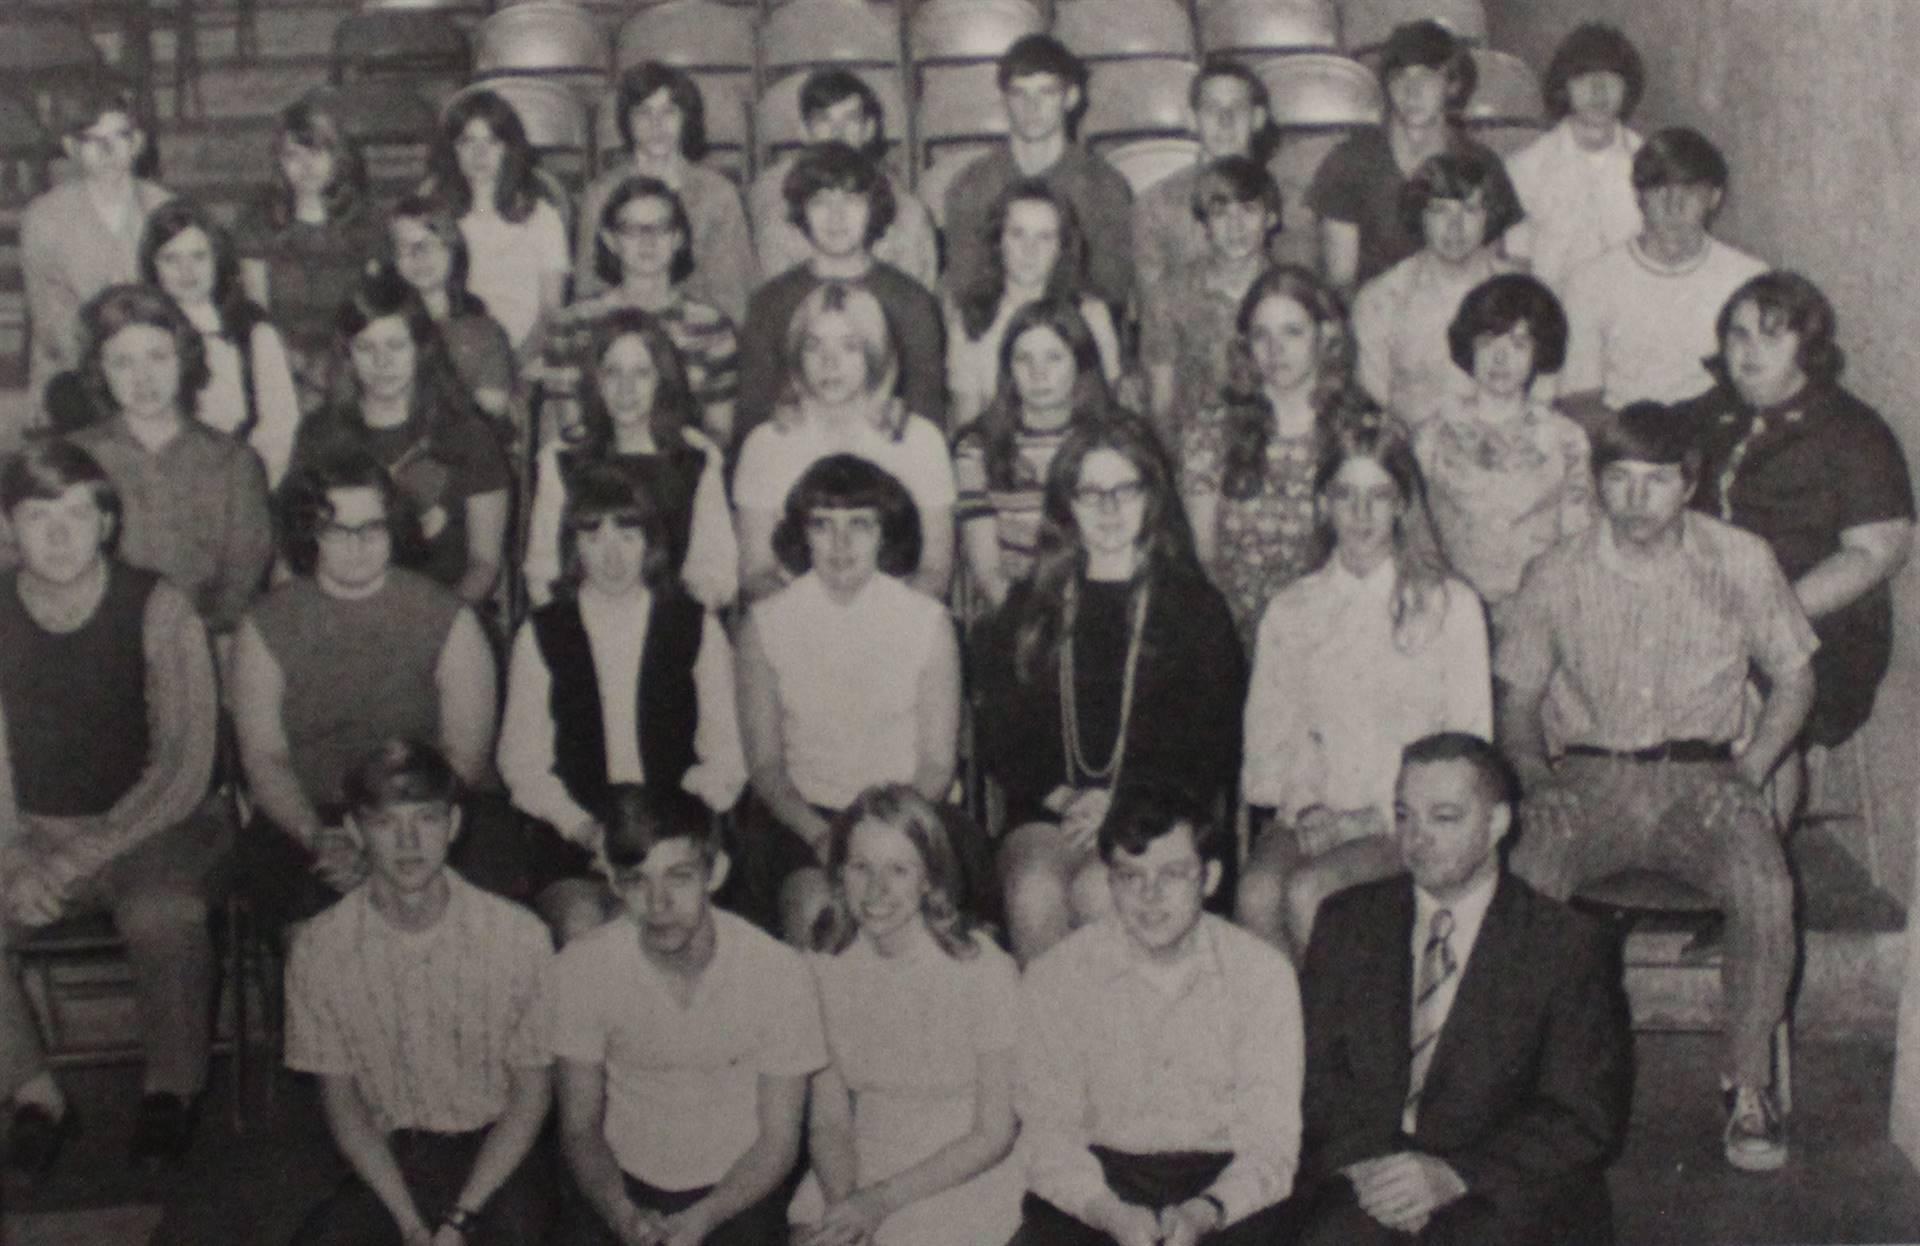 1972 Senior National Honor Society